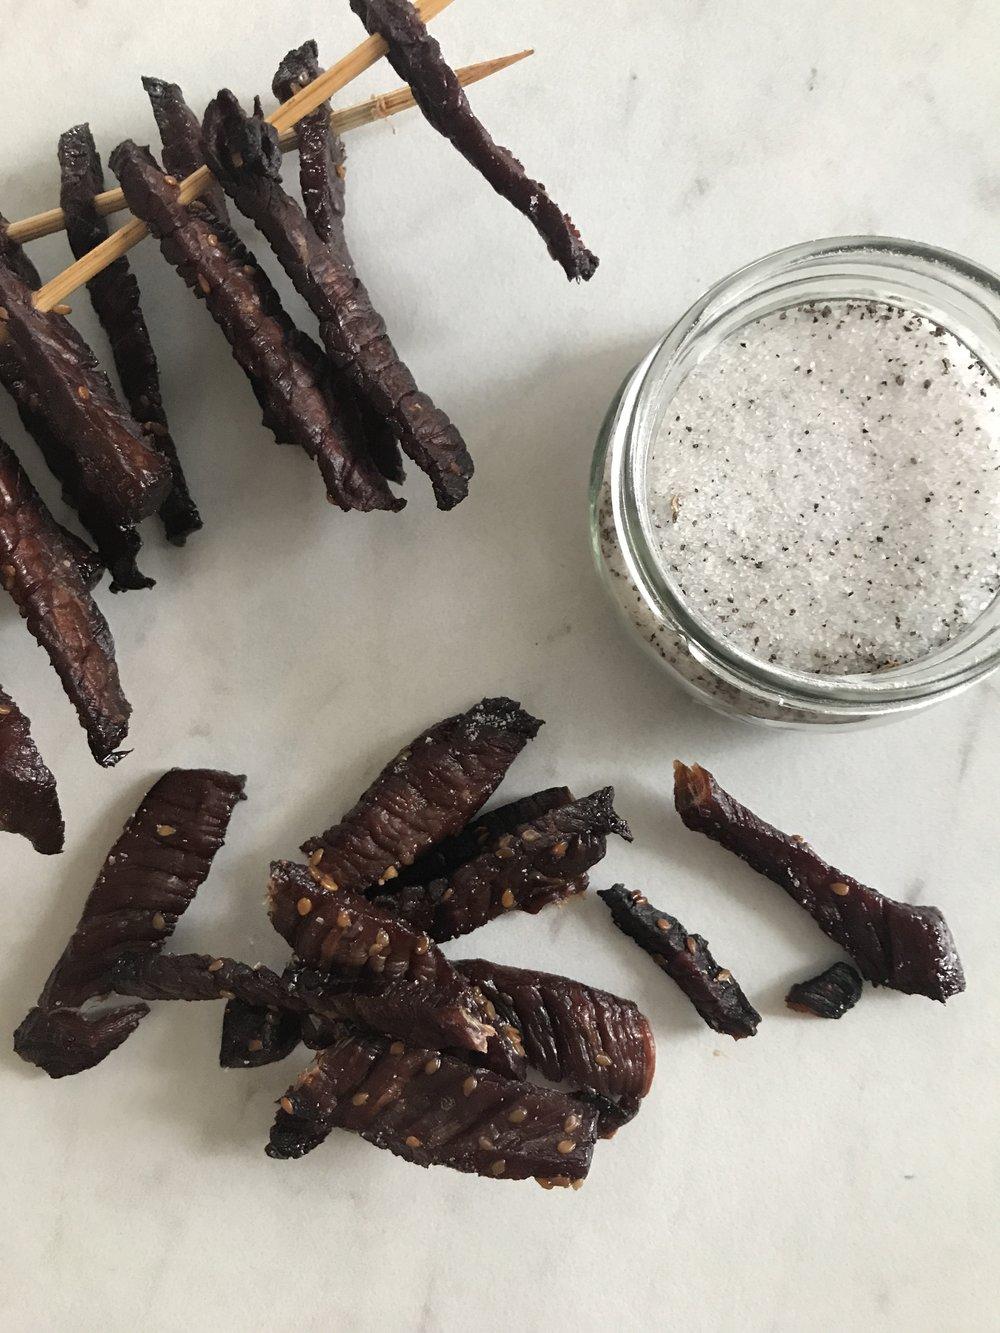 Add truffle salt to finish!